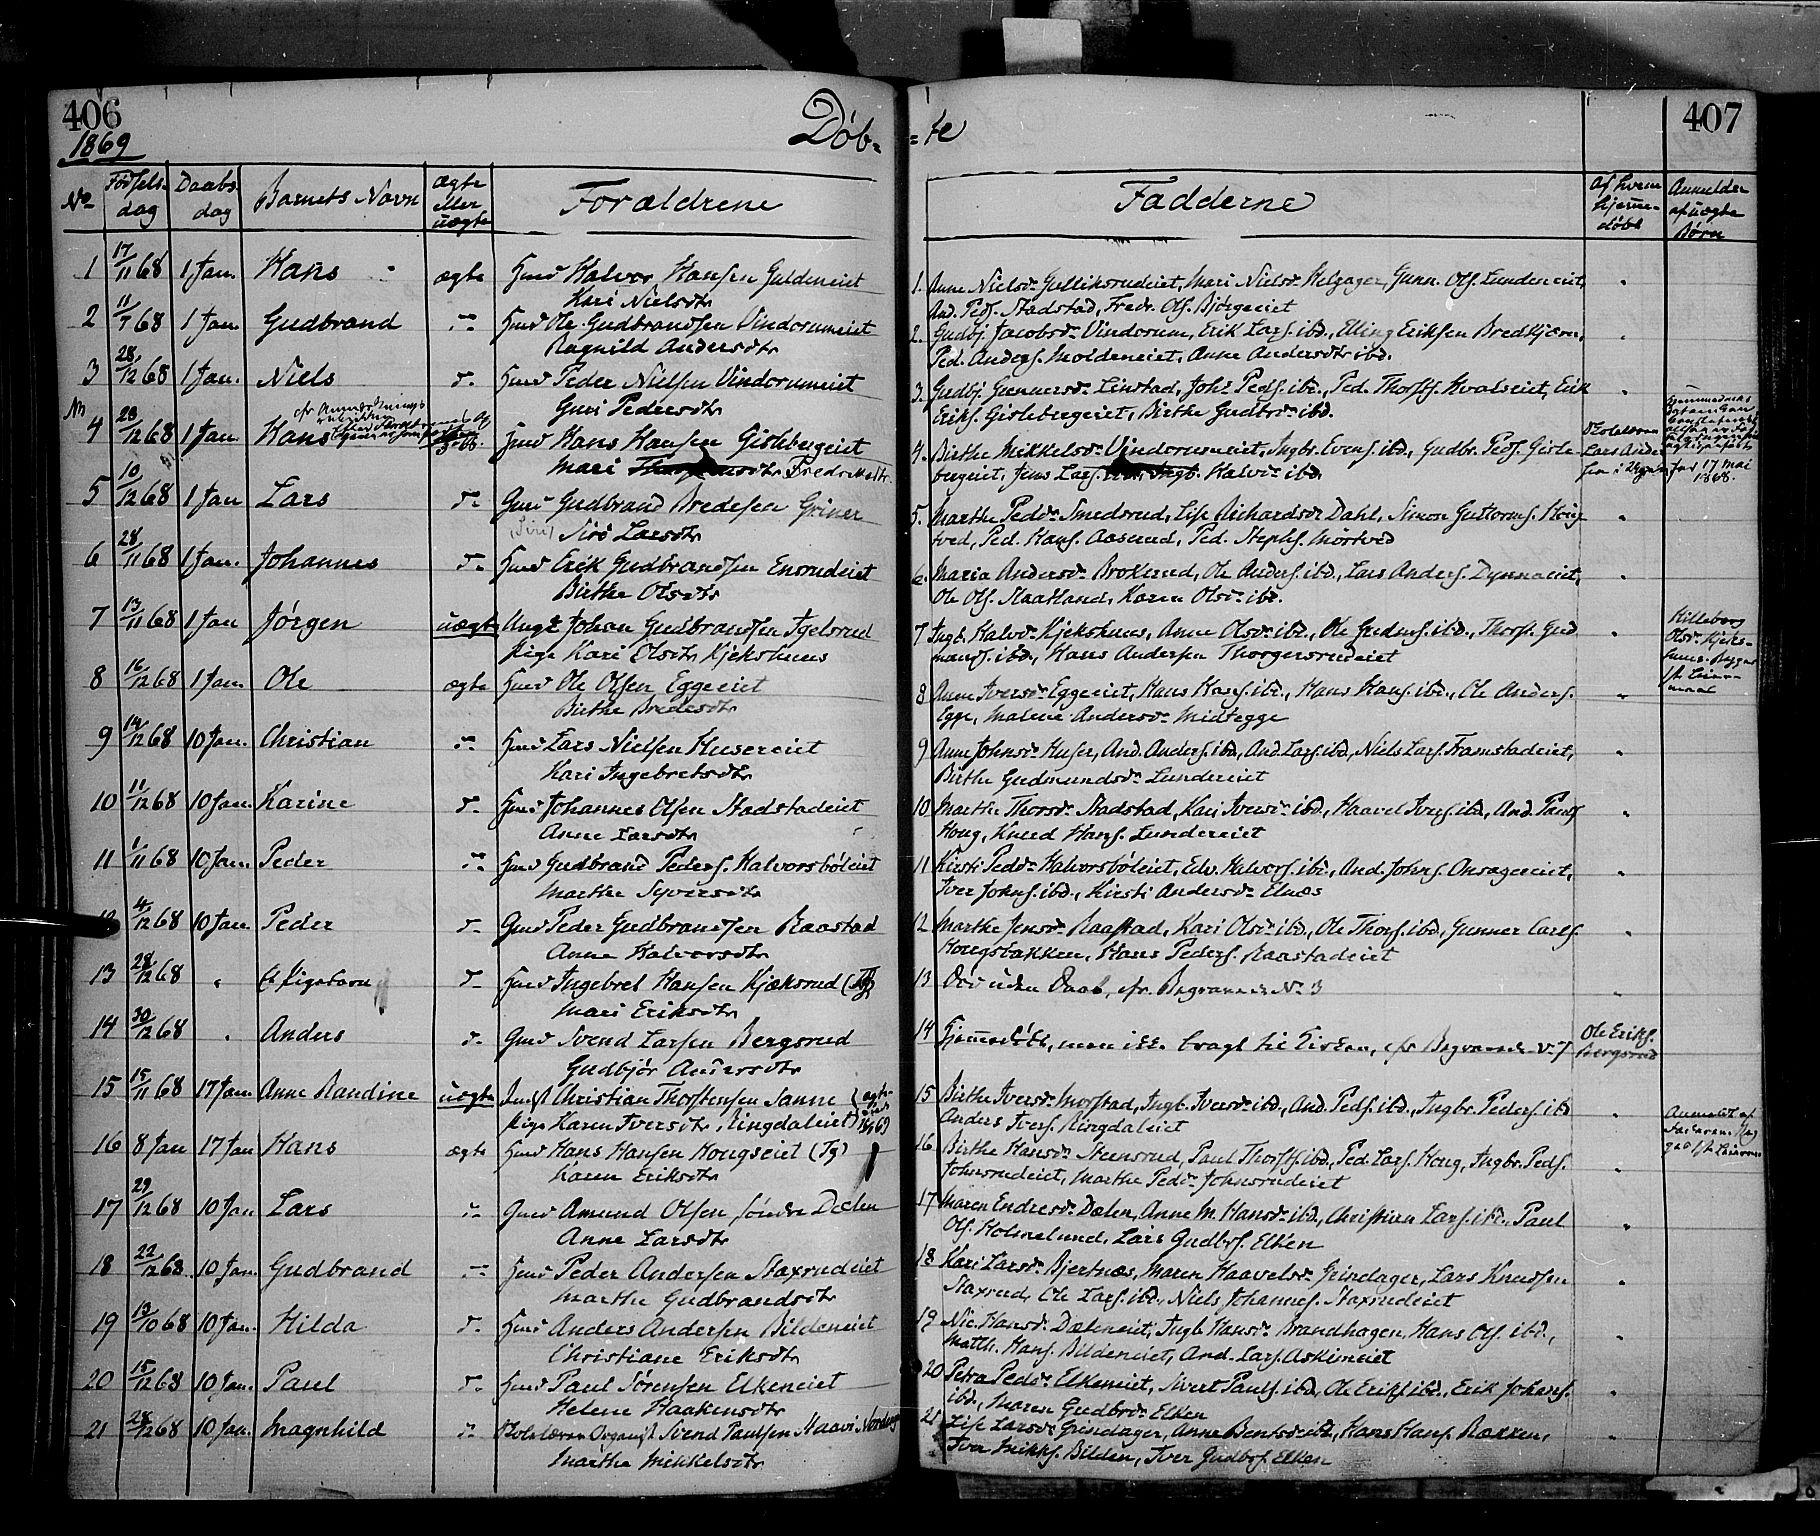 SAH, Gran prestekontor, Ministerialbok nr. 12, 1856-1874, s. 406-407